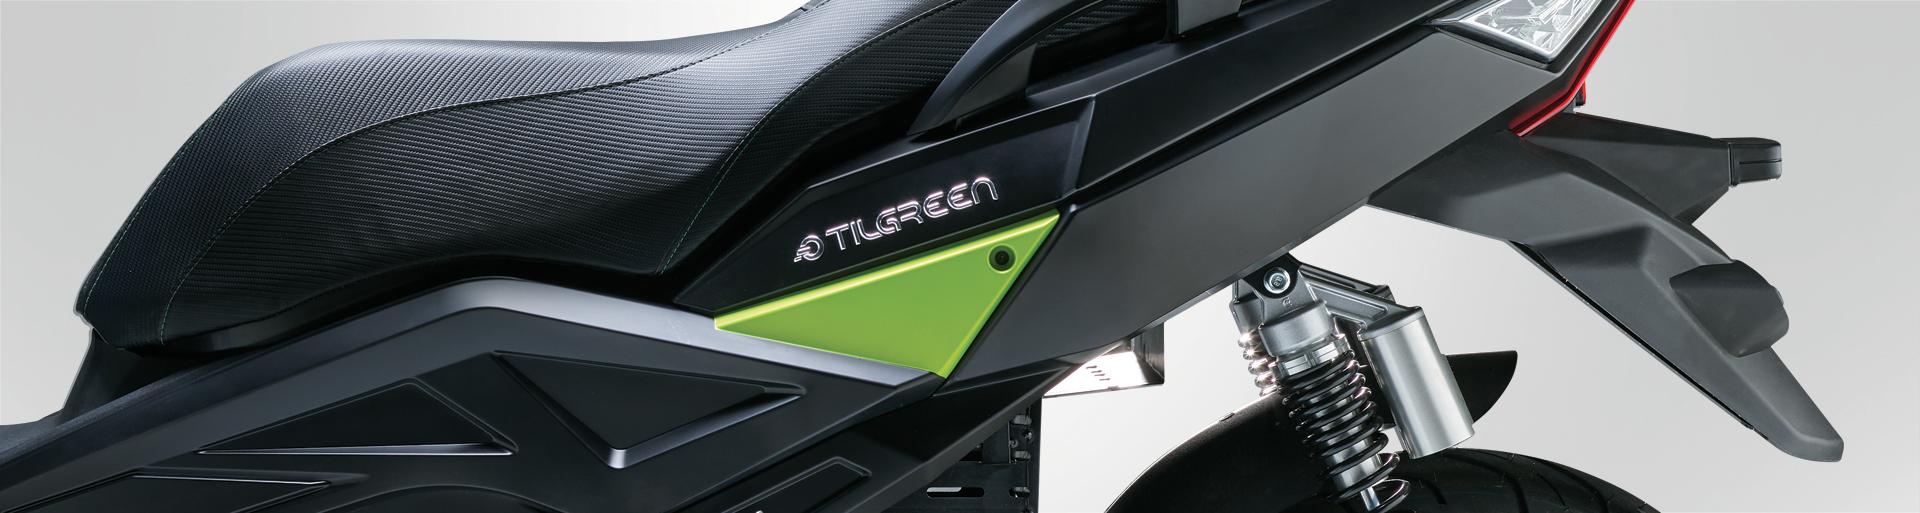 scooters-electriques-tilgreen-125-cm3-responsive